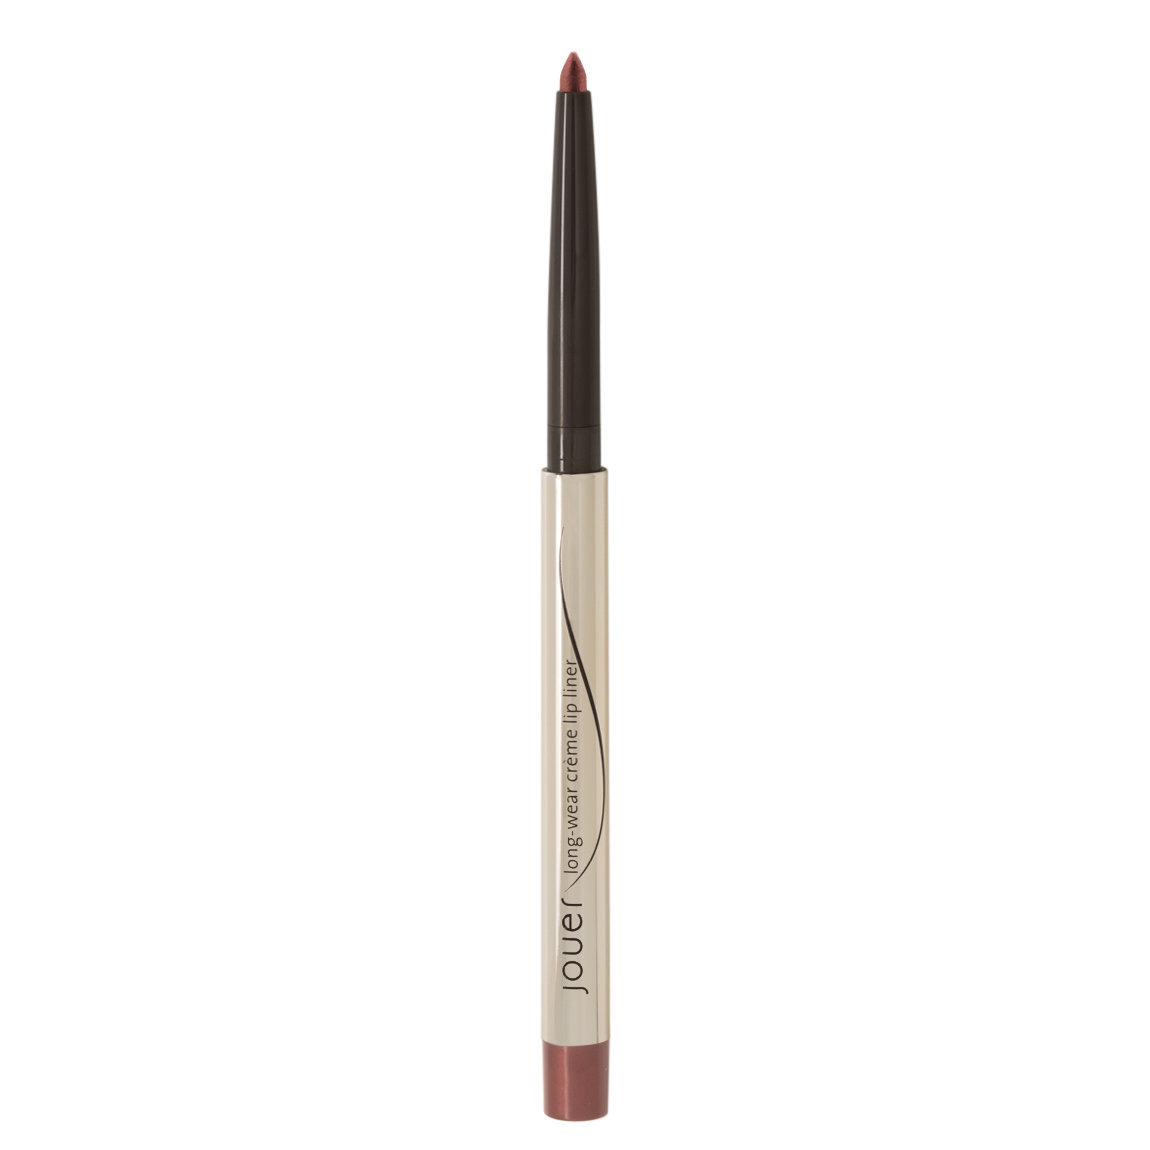 Jouer Cosmetics Long-Wear Crème Lip-Liner Clove Shimmer